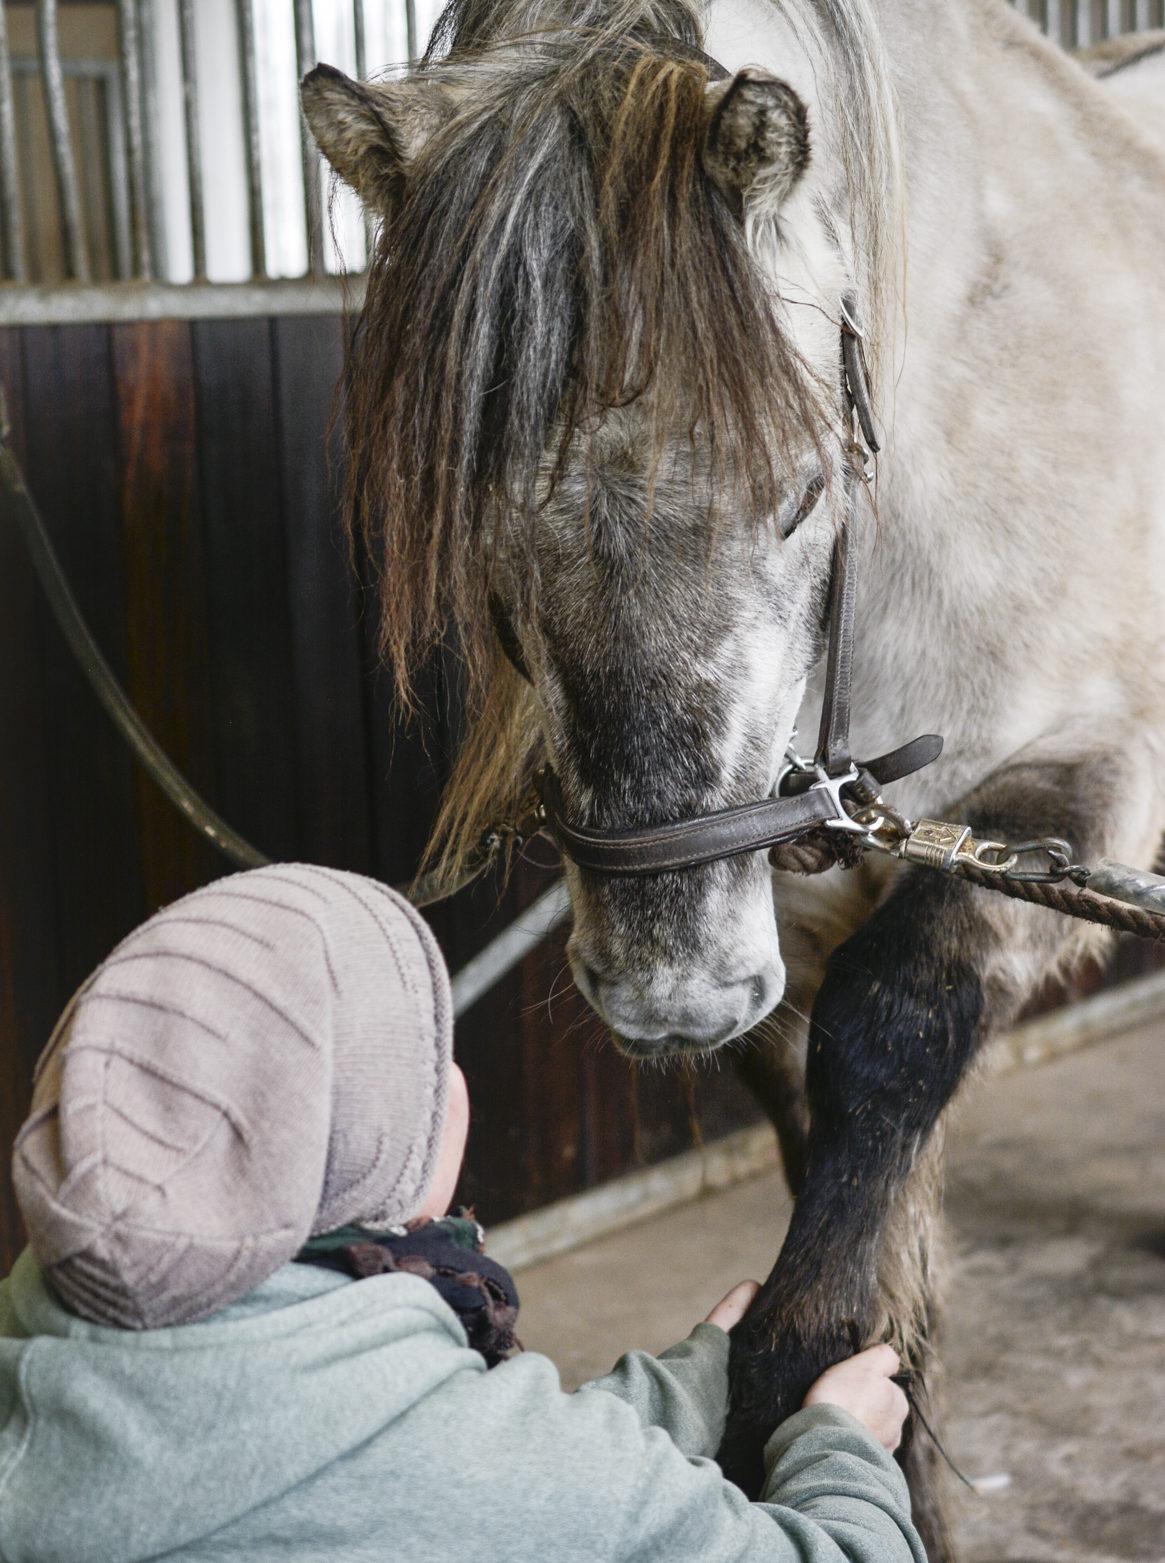 hestemassage rideskoler erhverv rideskoleheste pris